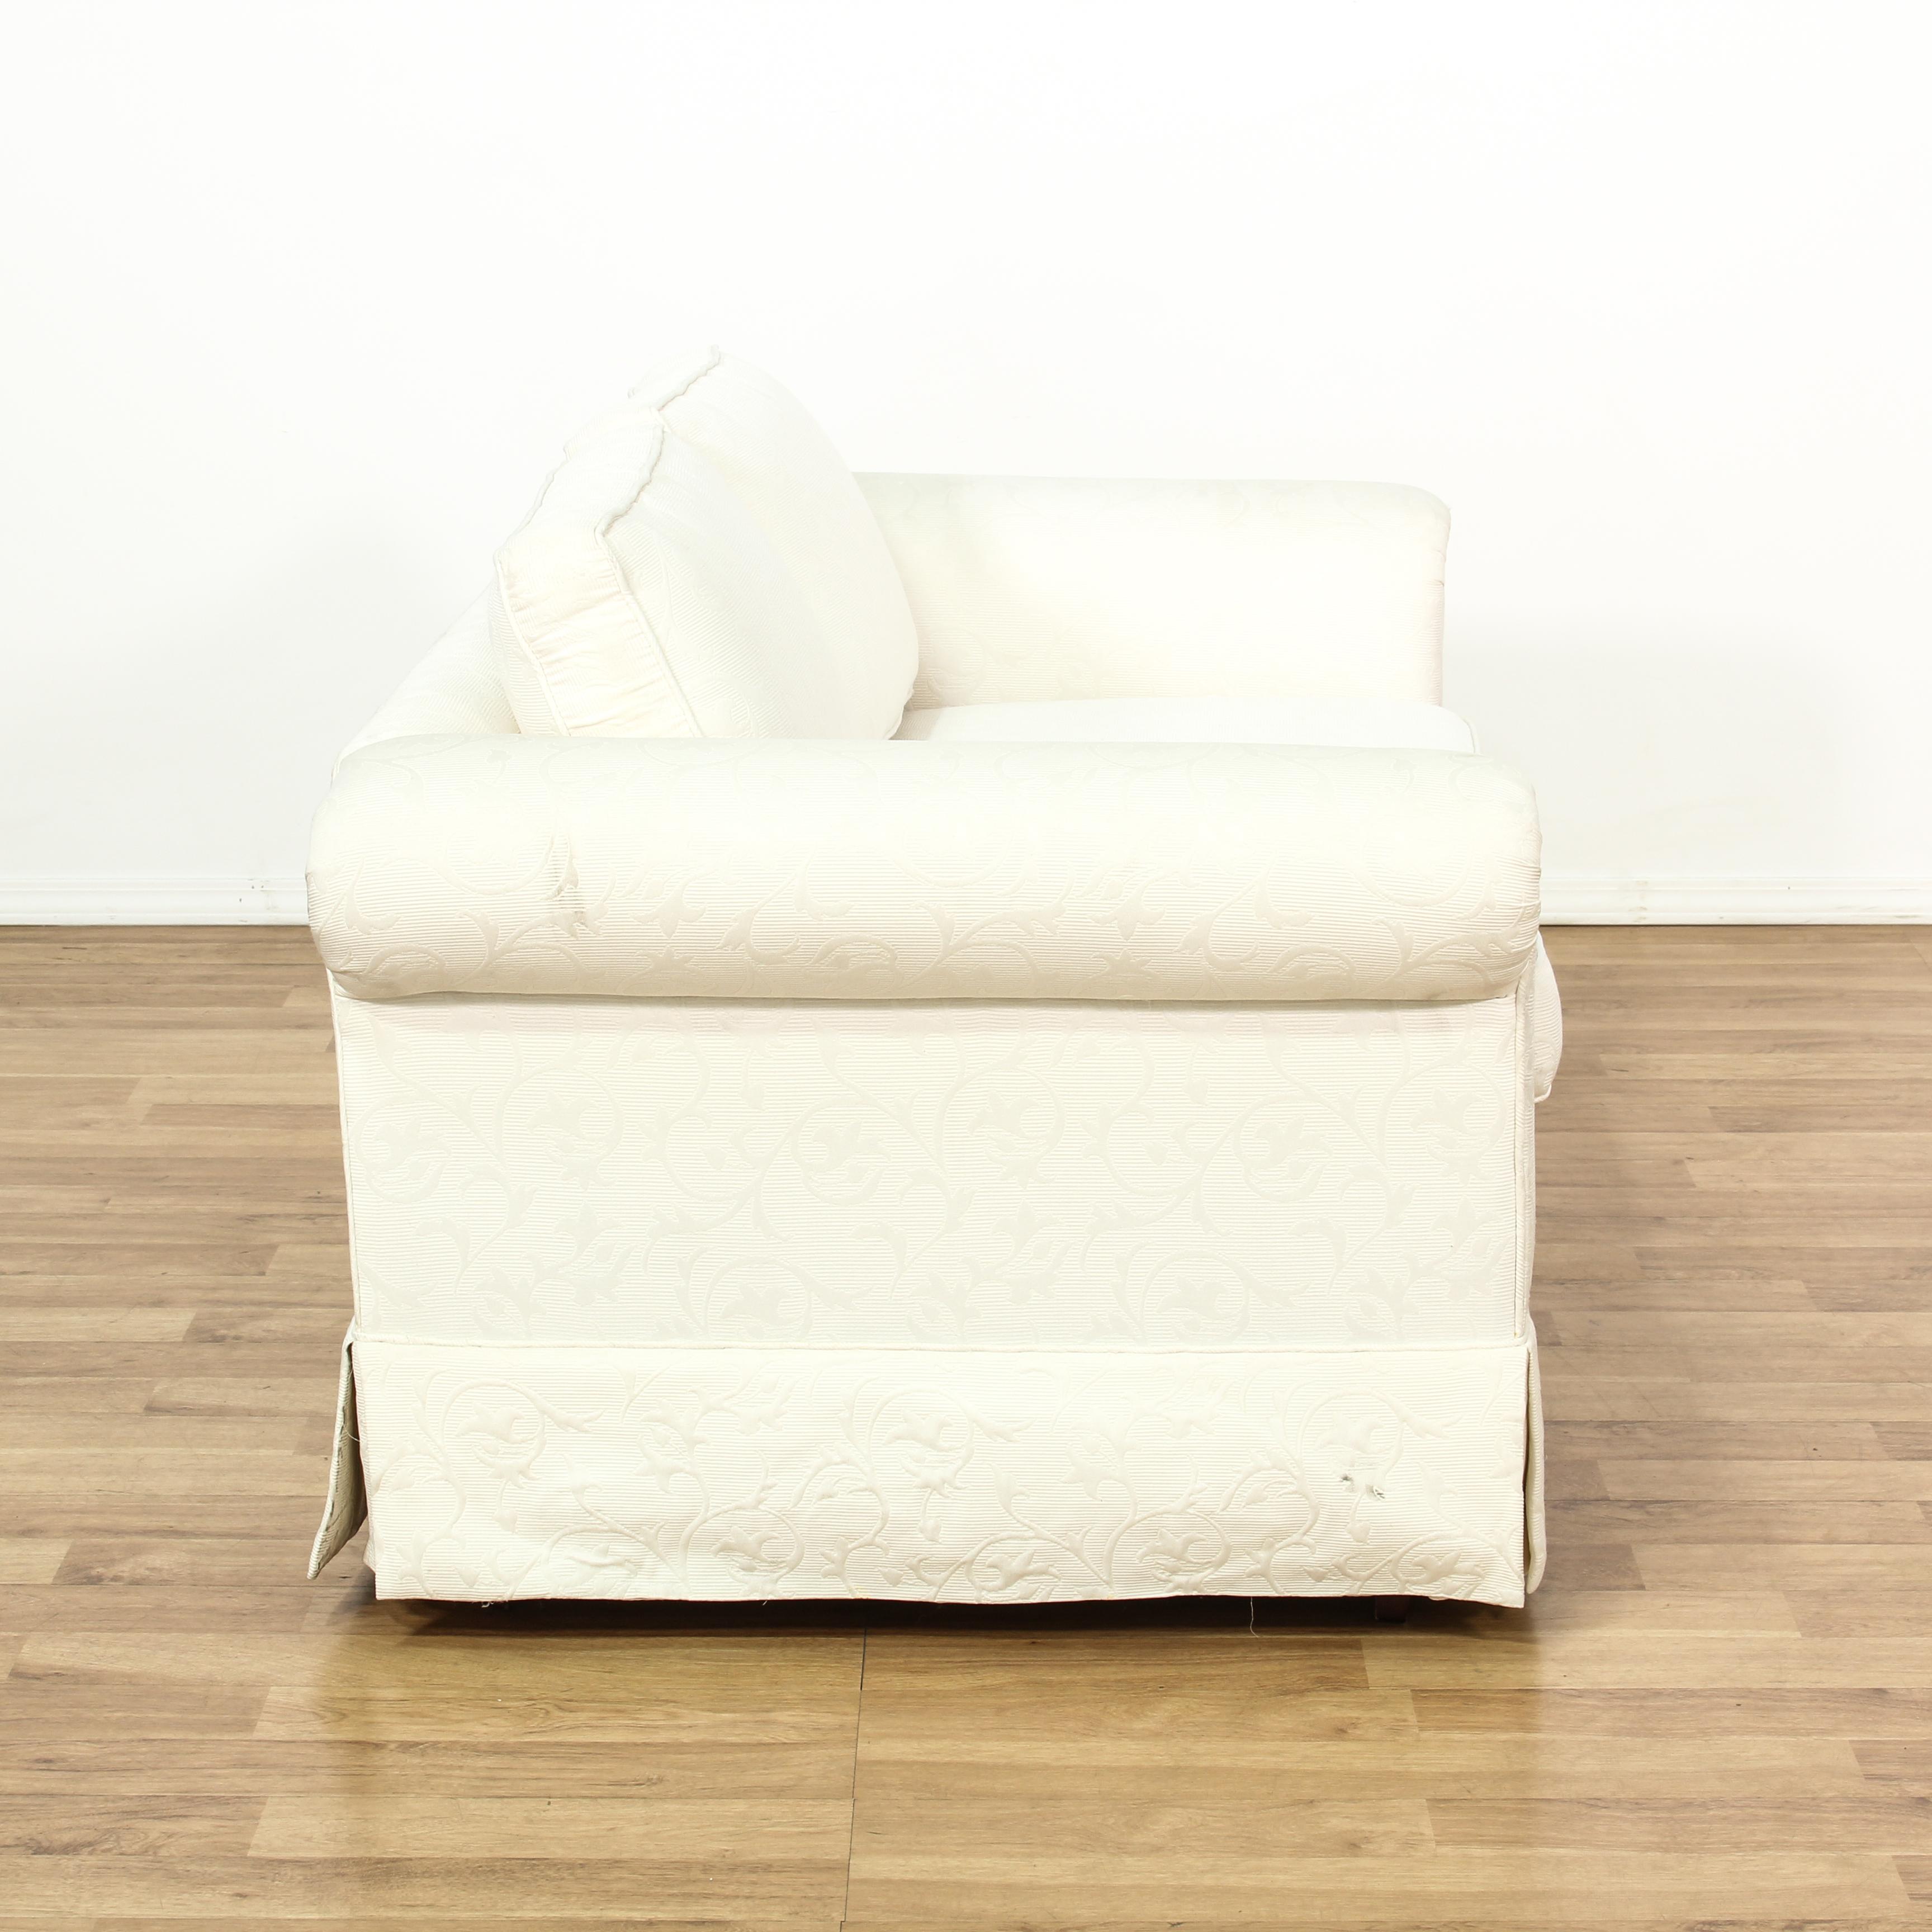 damask sofa bed living room set white loveseat couch vintage furniture